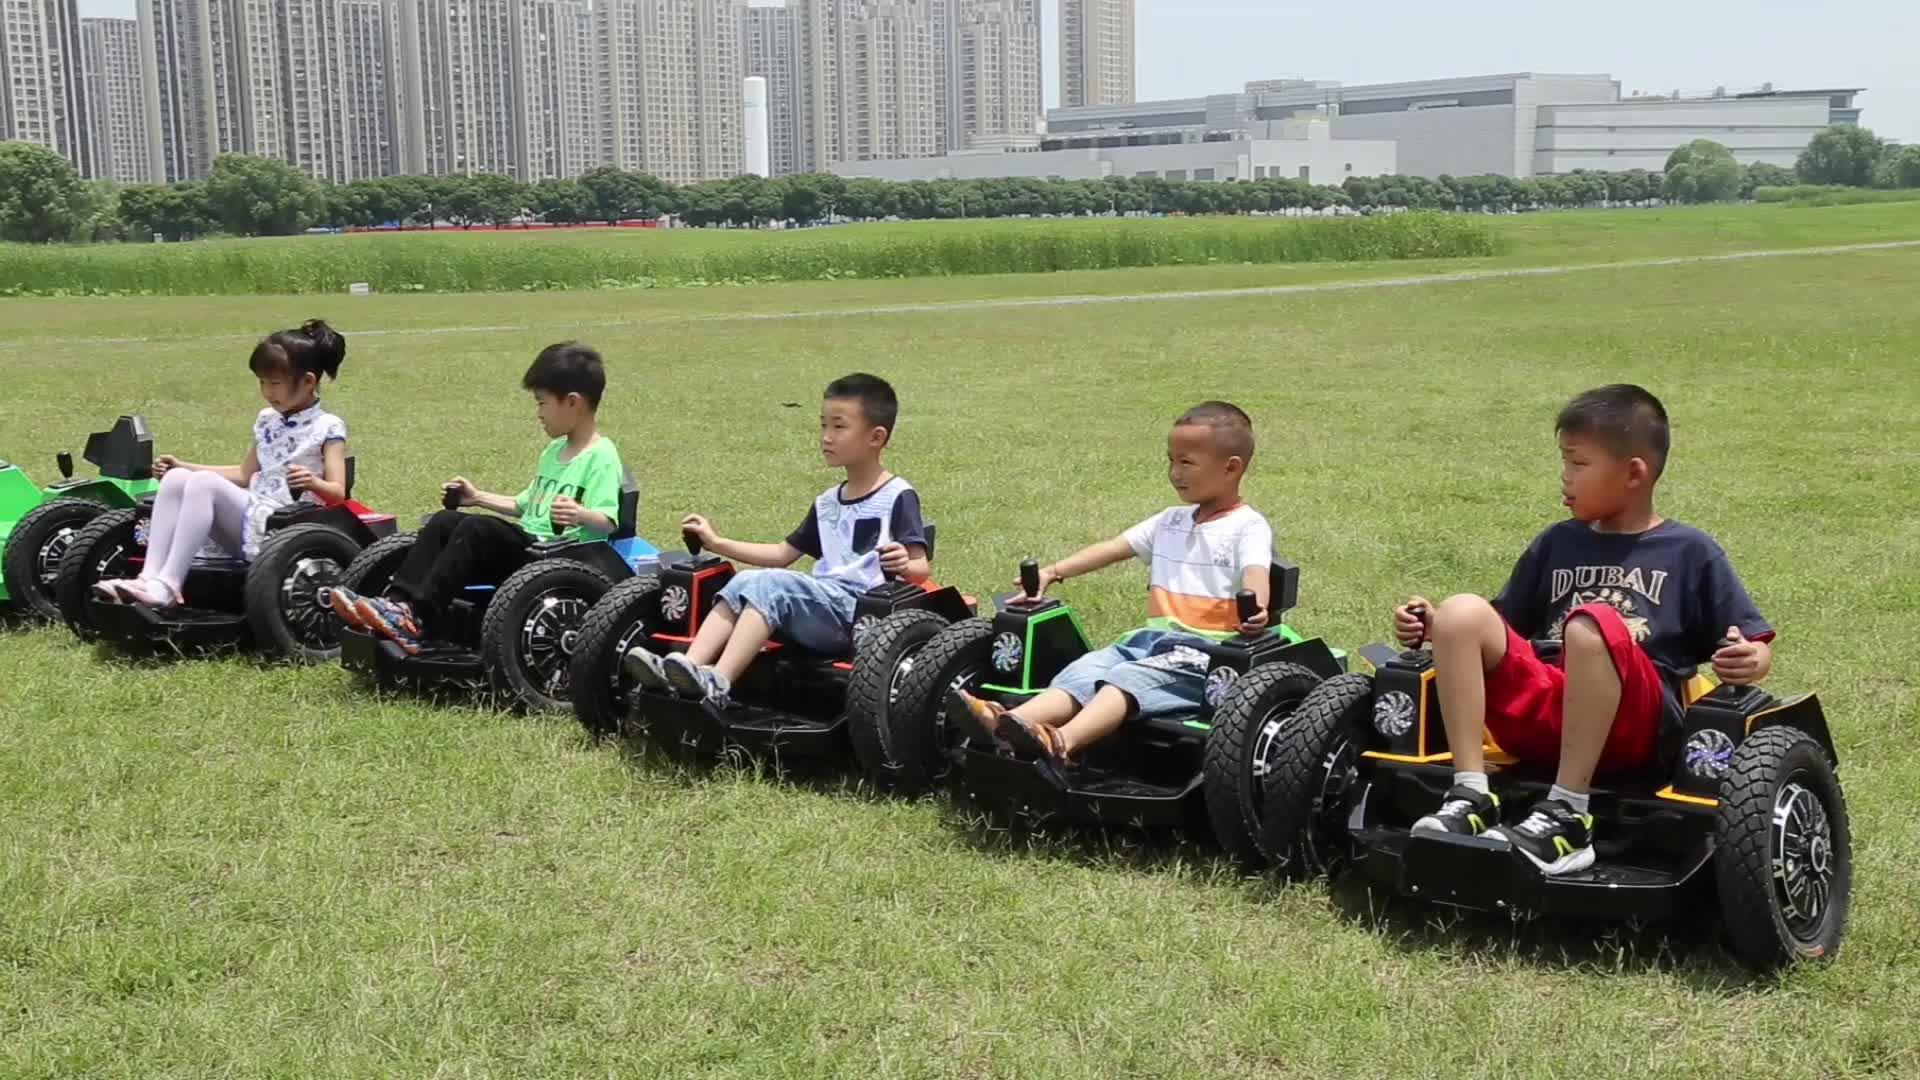 Playground Kids Battery Bumper Grass Car For Sale FLLC-10001